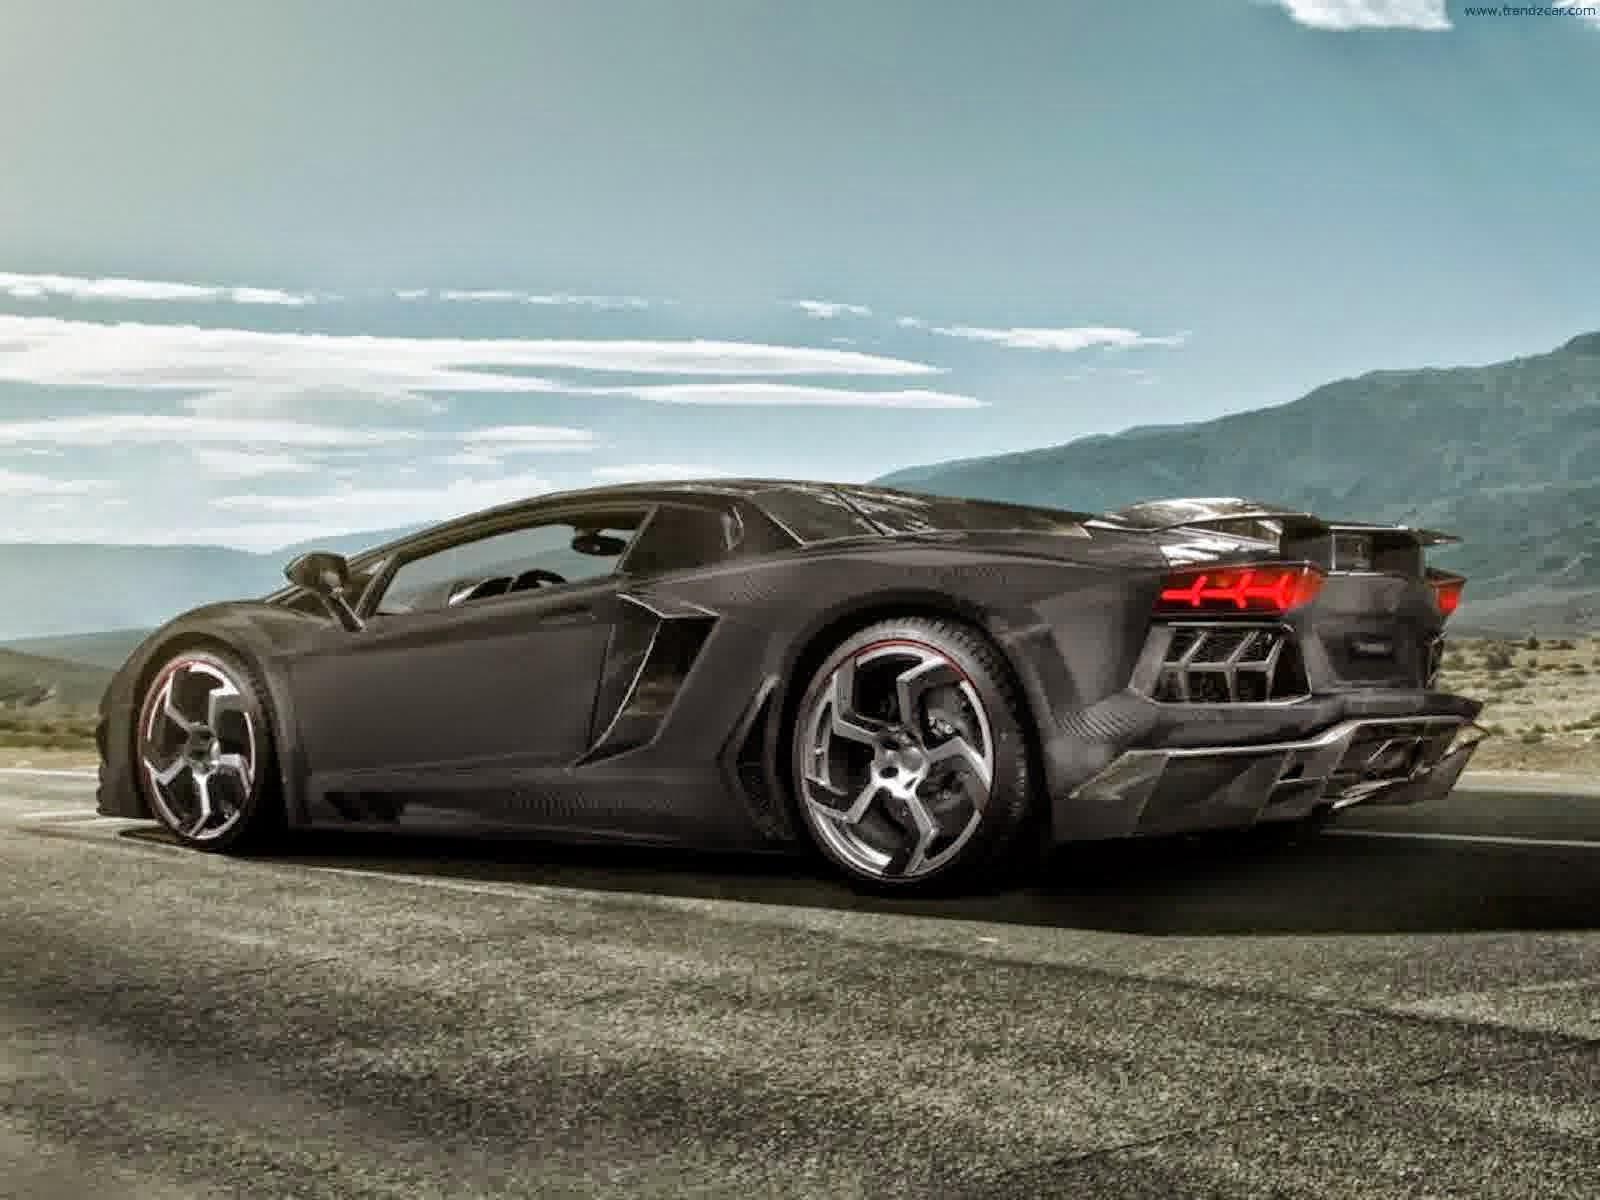 3 Black Lamborghini Aventador Wallpapers On The Mountain